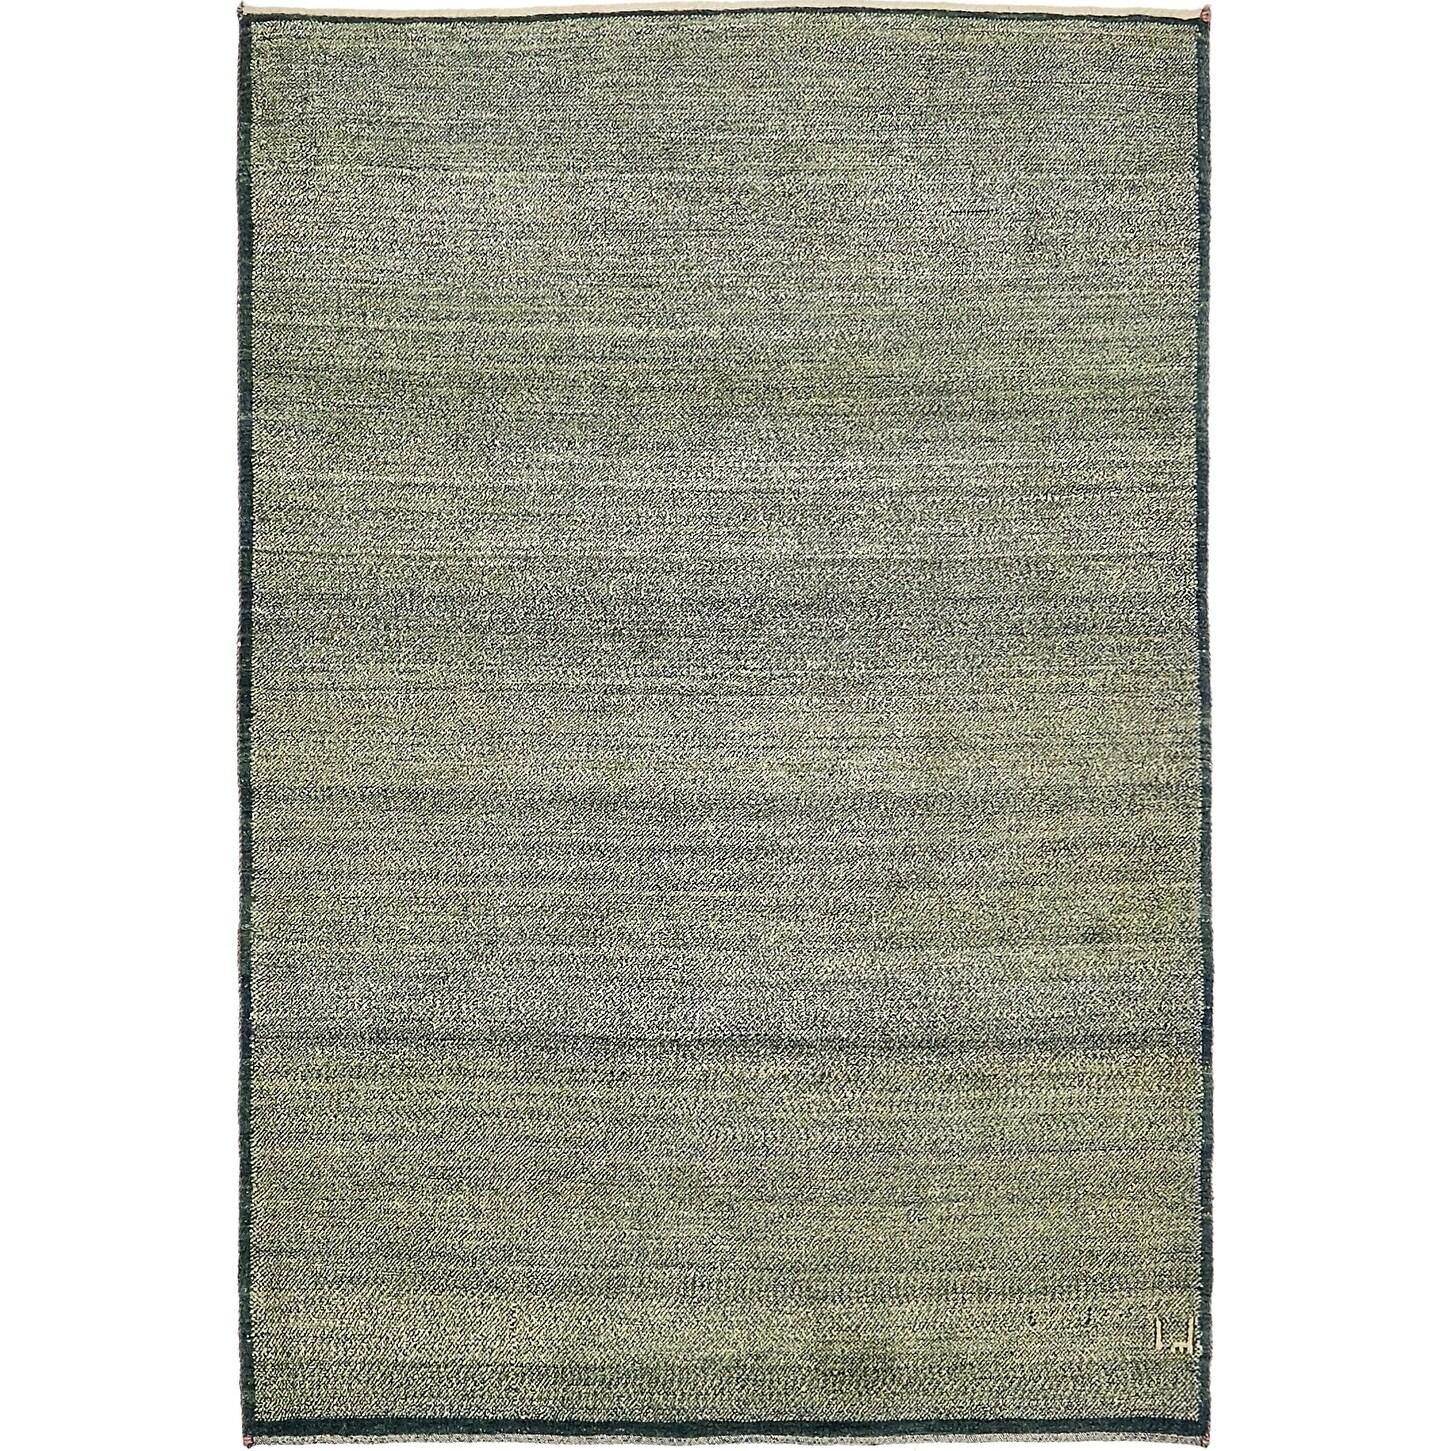 Hand Knotted Kashkuli Gabbeh Wool Area Rug - 4 x 5 11 (Green - 4 x 5 11)